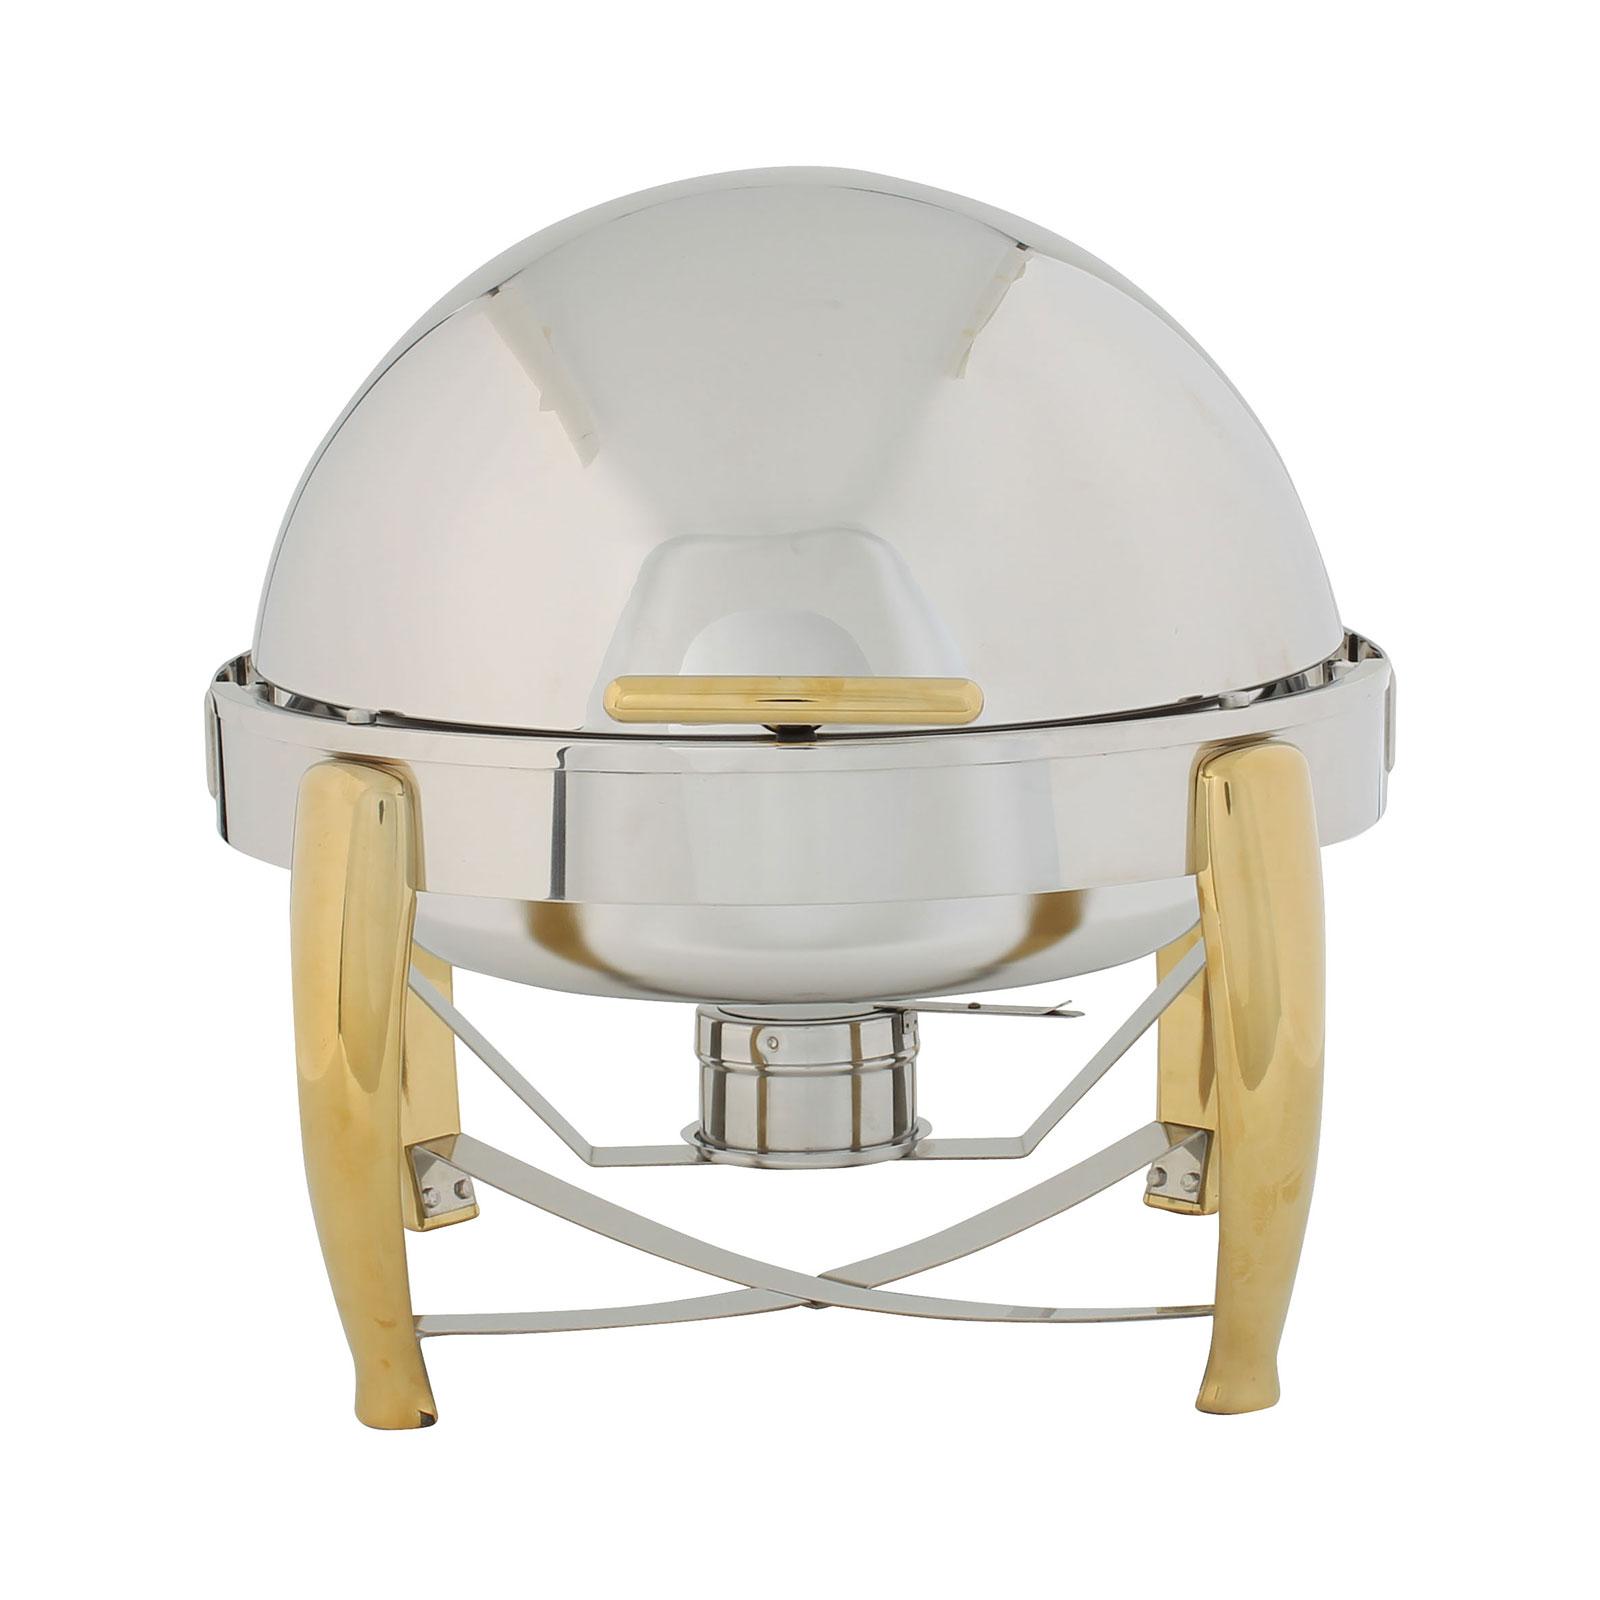 Winco 103A chafing dish